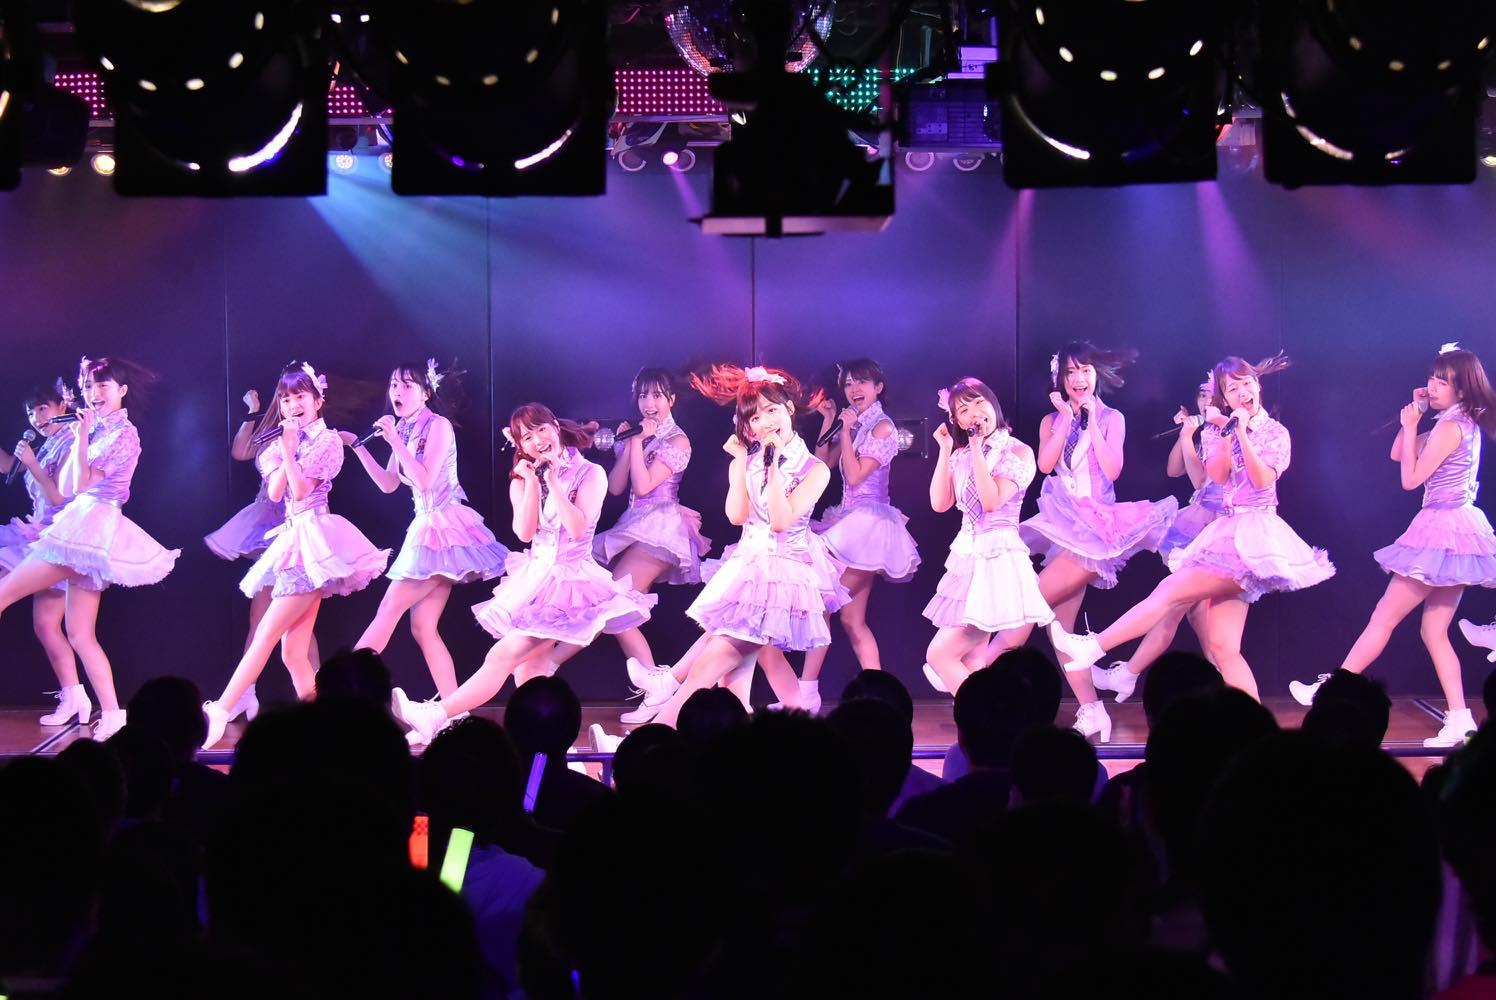 AKB48チーム8が新曲『好きだ 好きだ 好きだ』を初披露、全国ツアーの⽇程も発表【写真6枚】の画像001